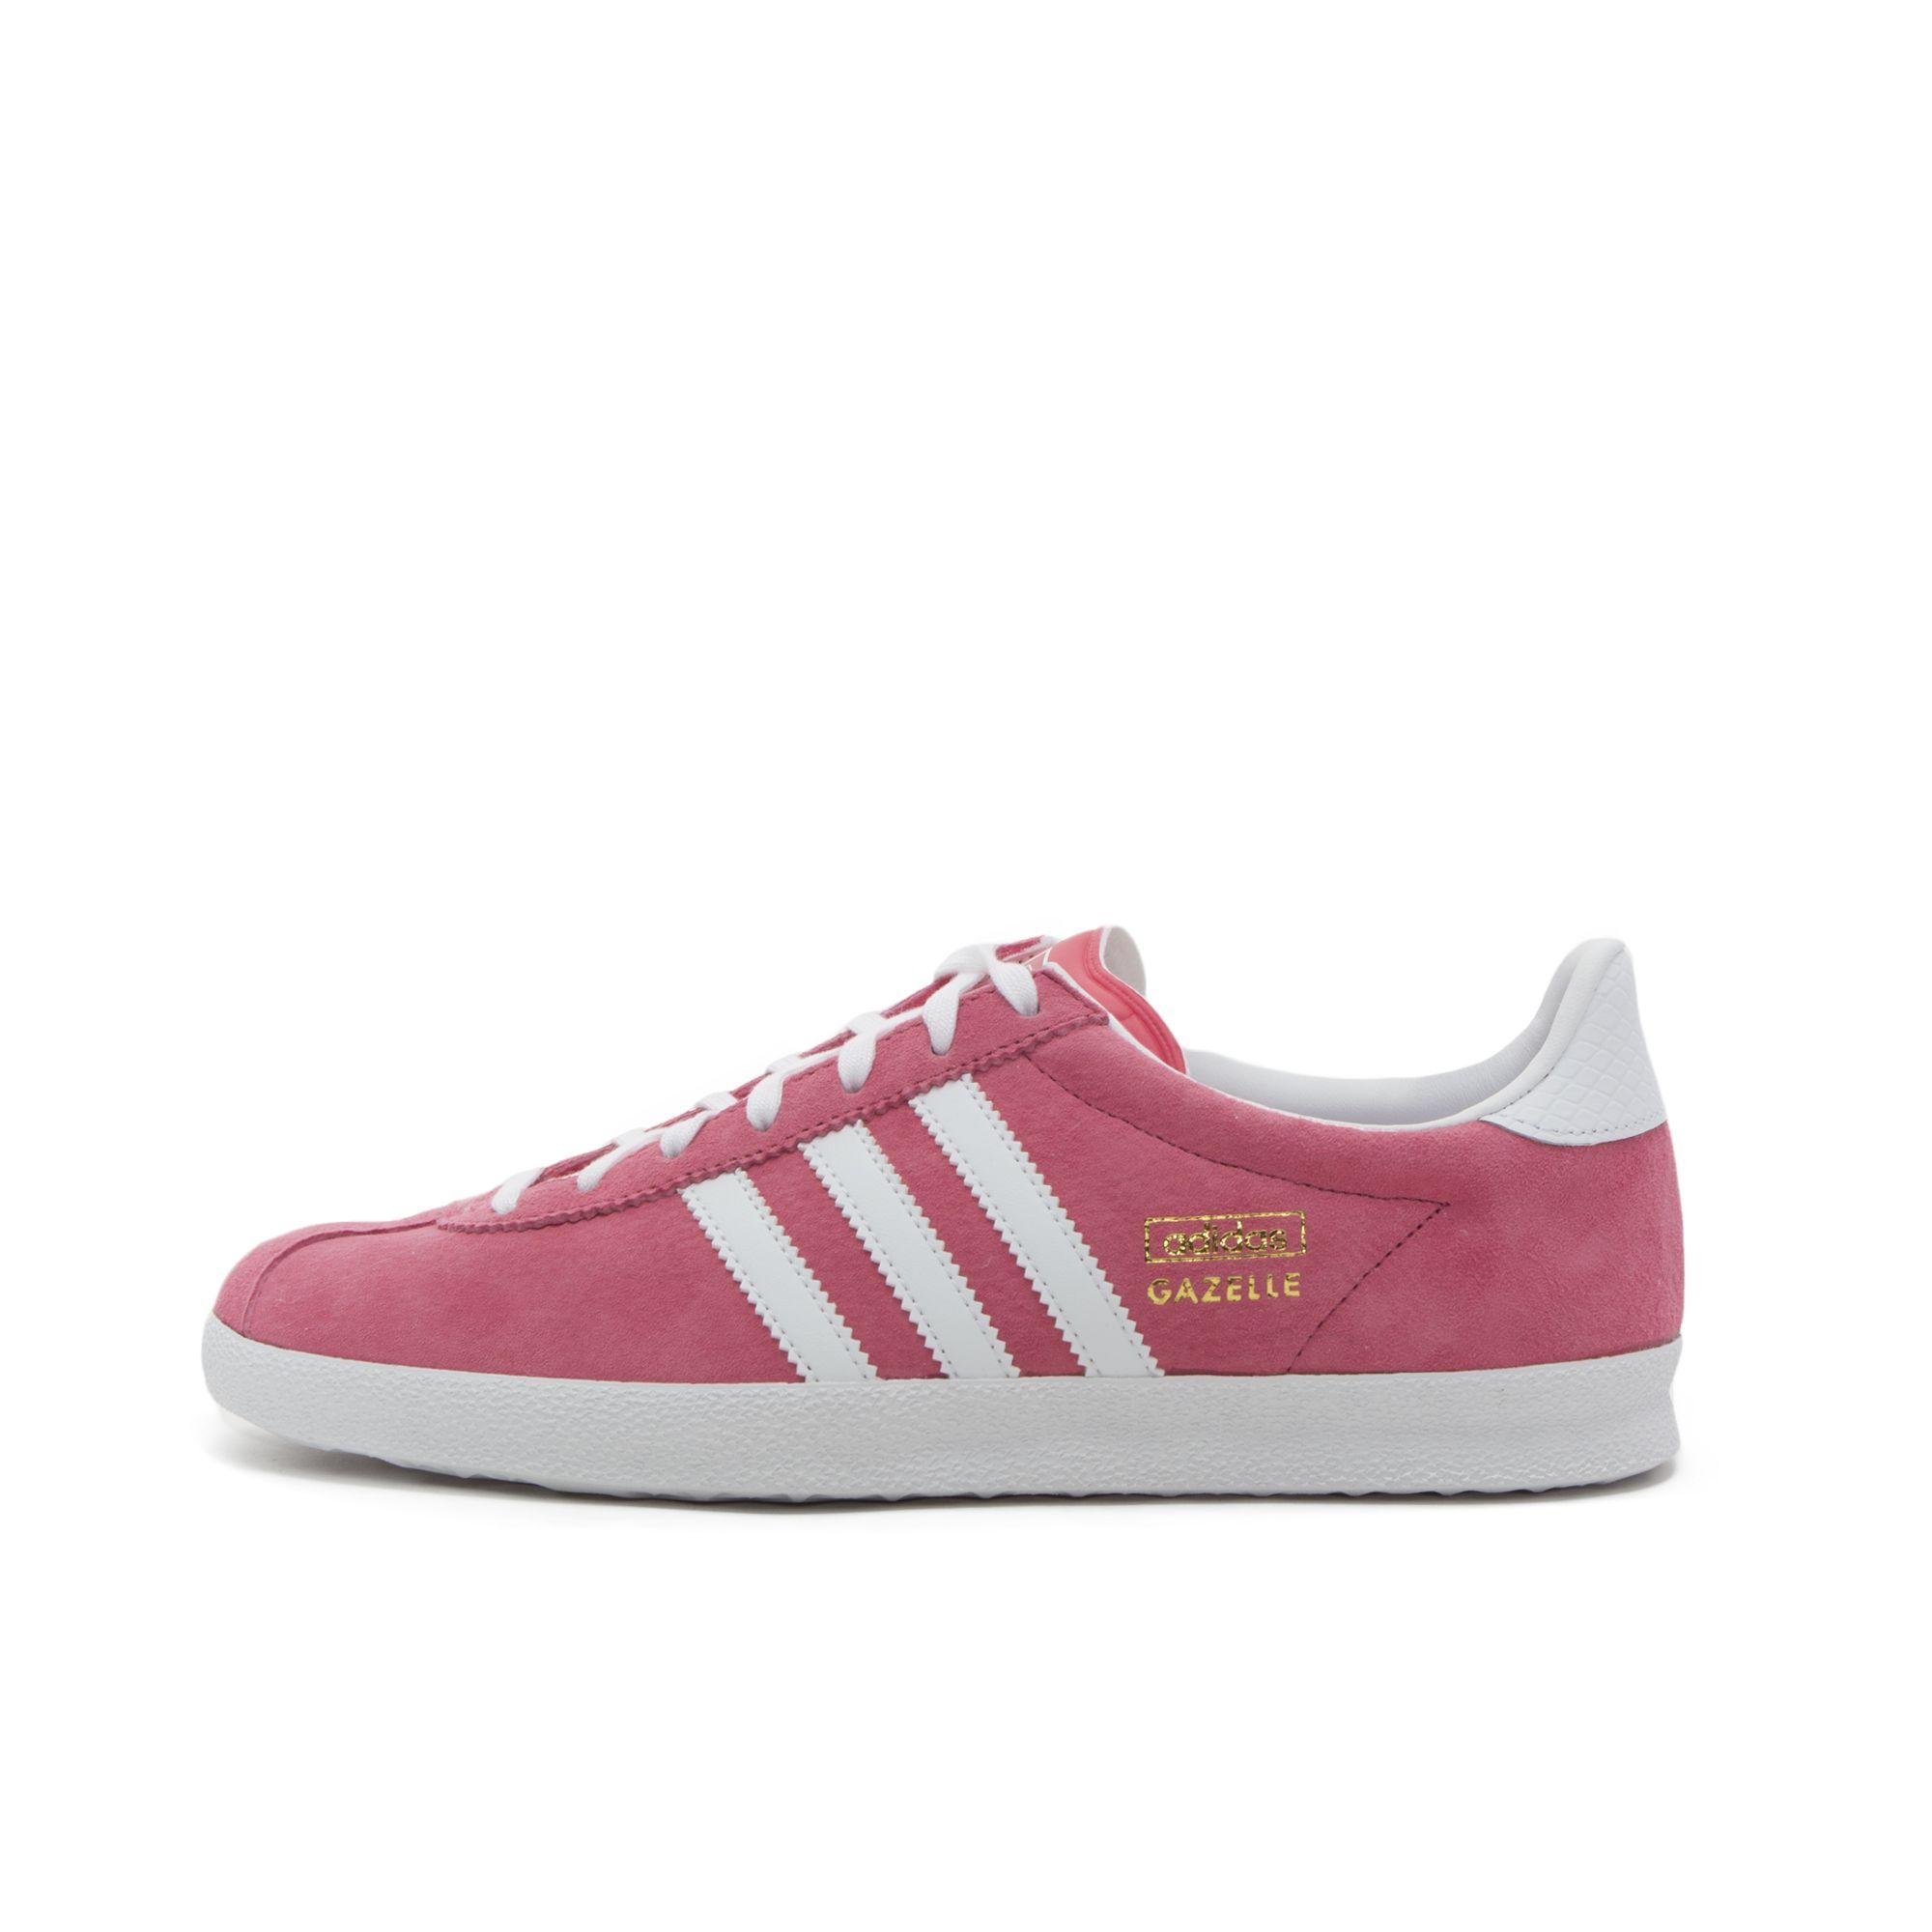 IKKS x Adidas - 95€ | Adidas gazelle, Adidas samba sneakers ...